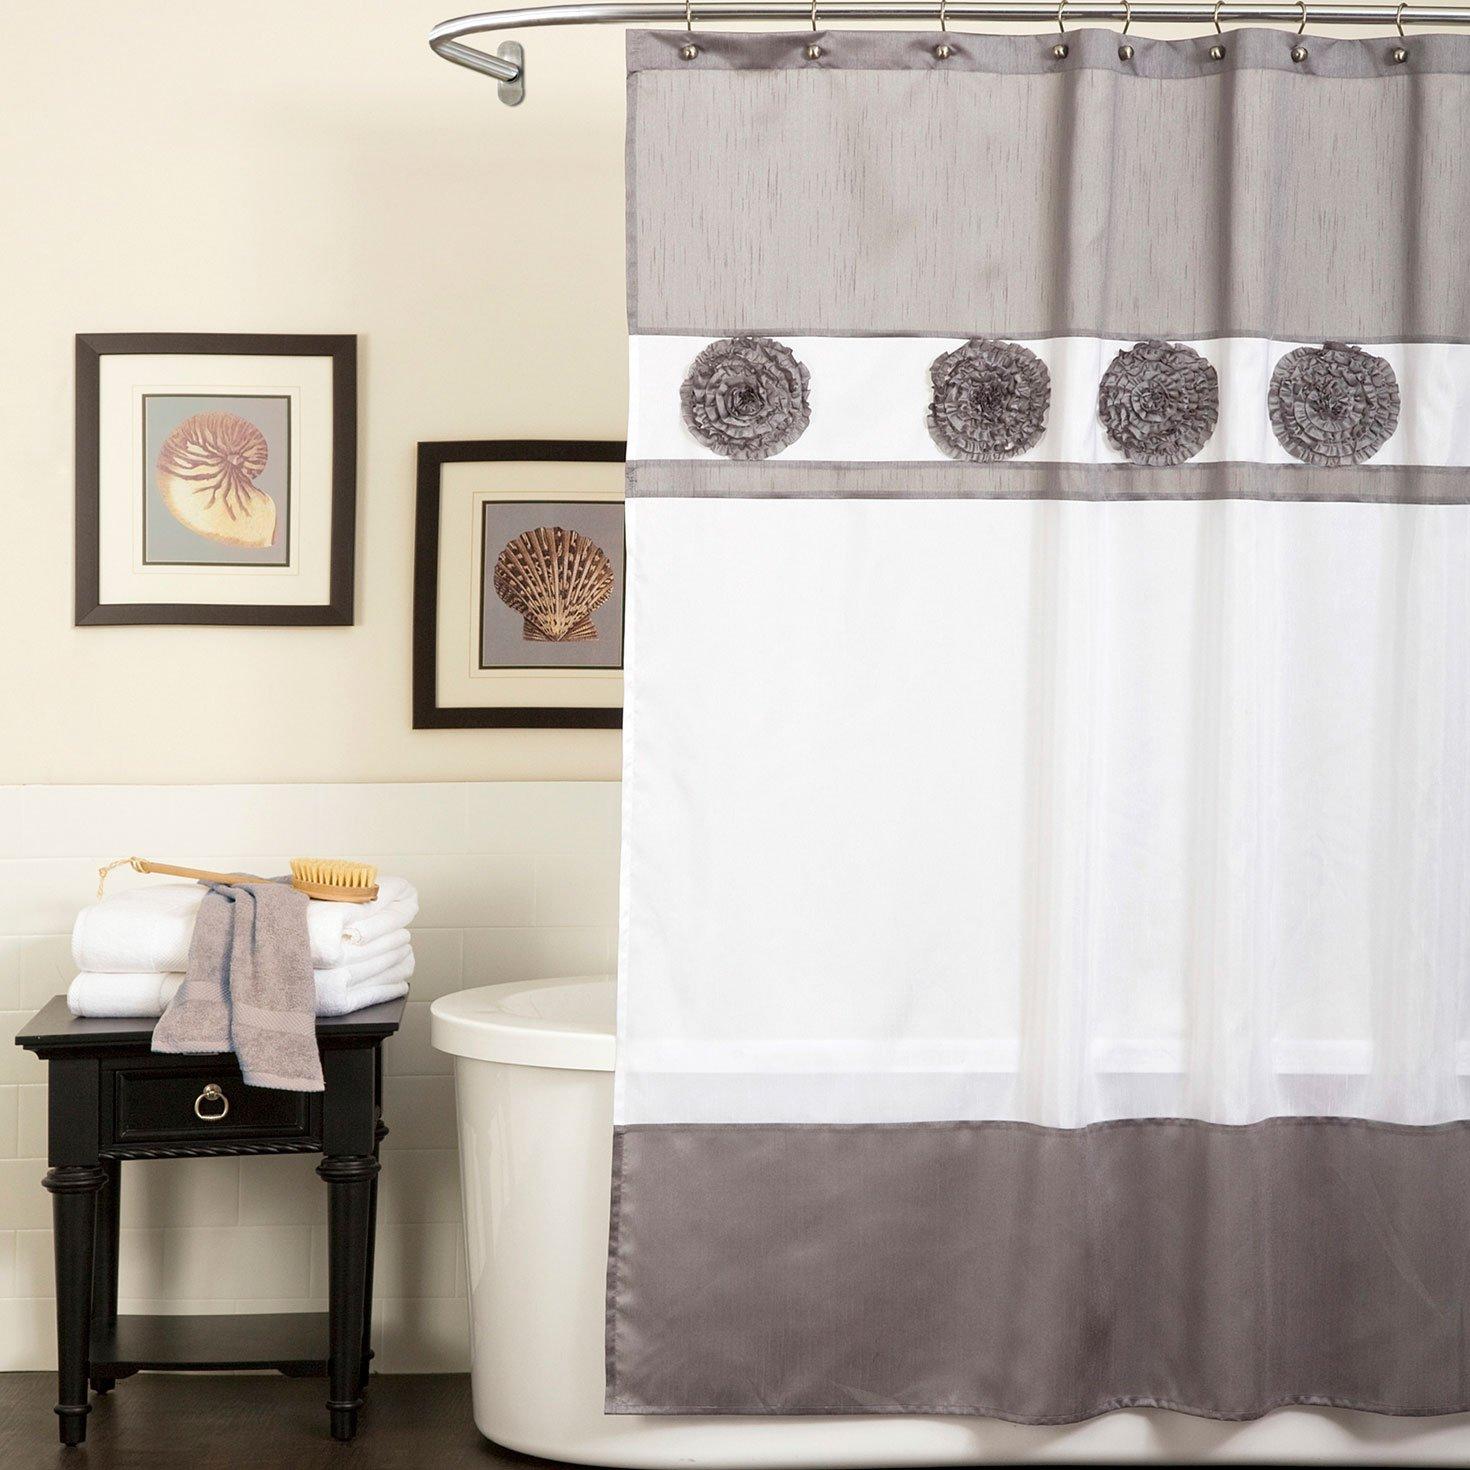 Triangle Home Fashions 15978 Lush Decor Seascape Shower Curtain, Gray